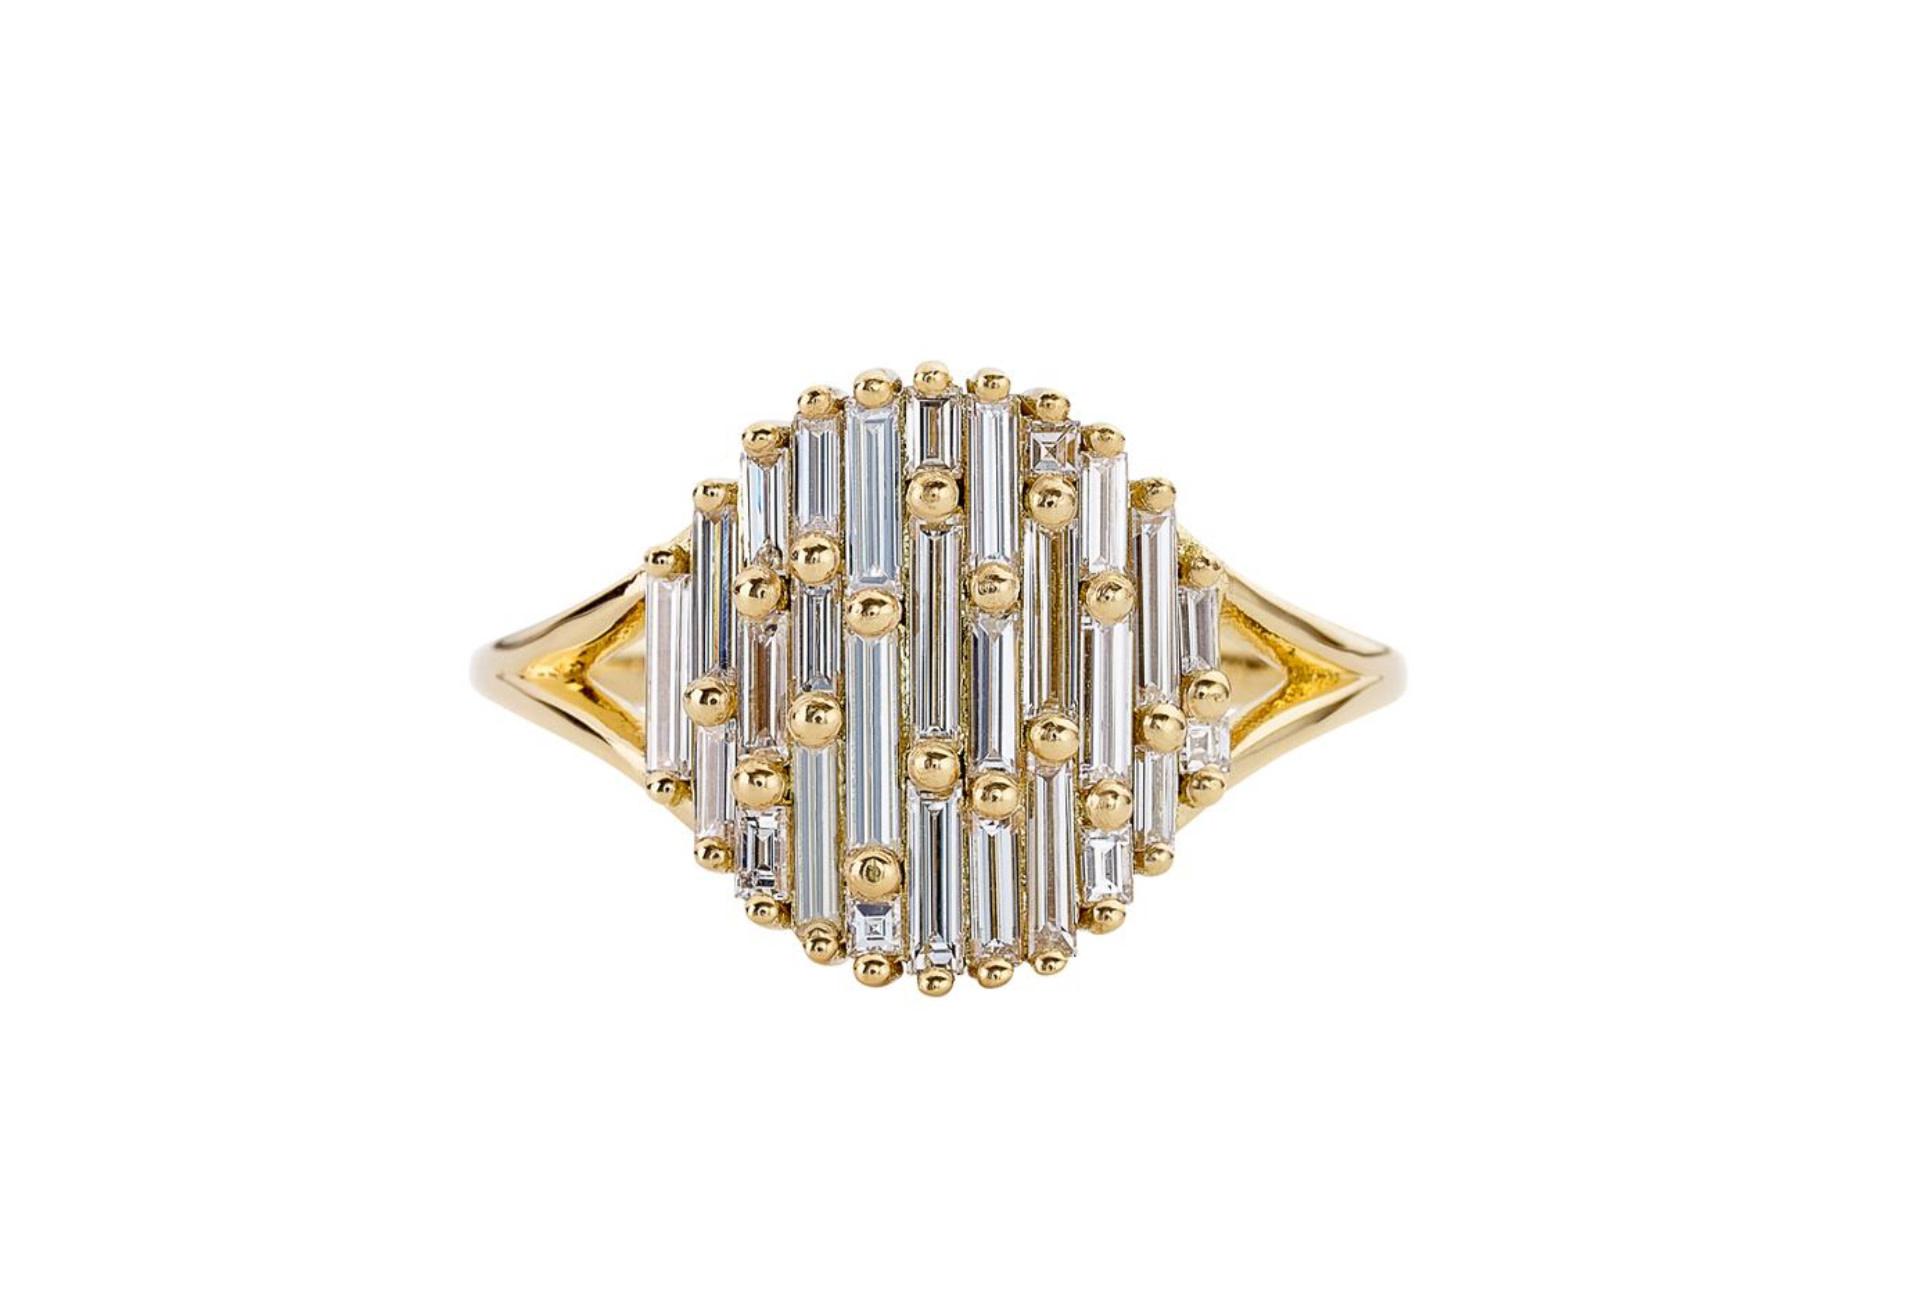 Artëmer Light Catcher Baguette Diamond Cluster Ring